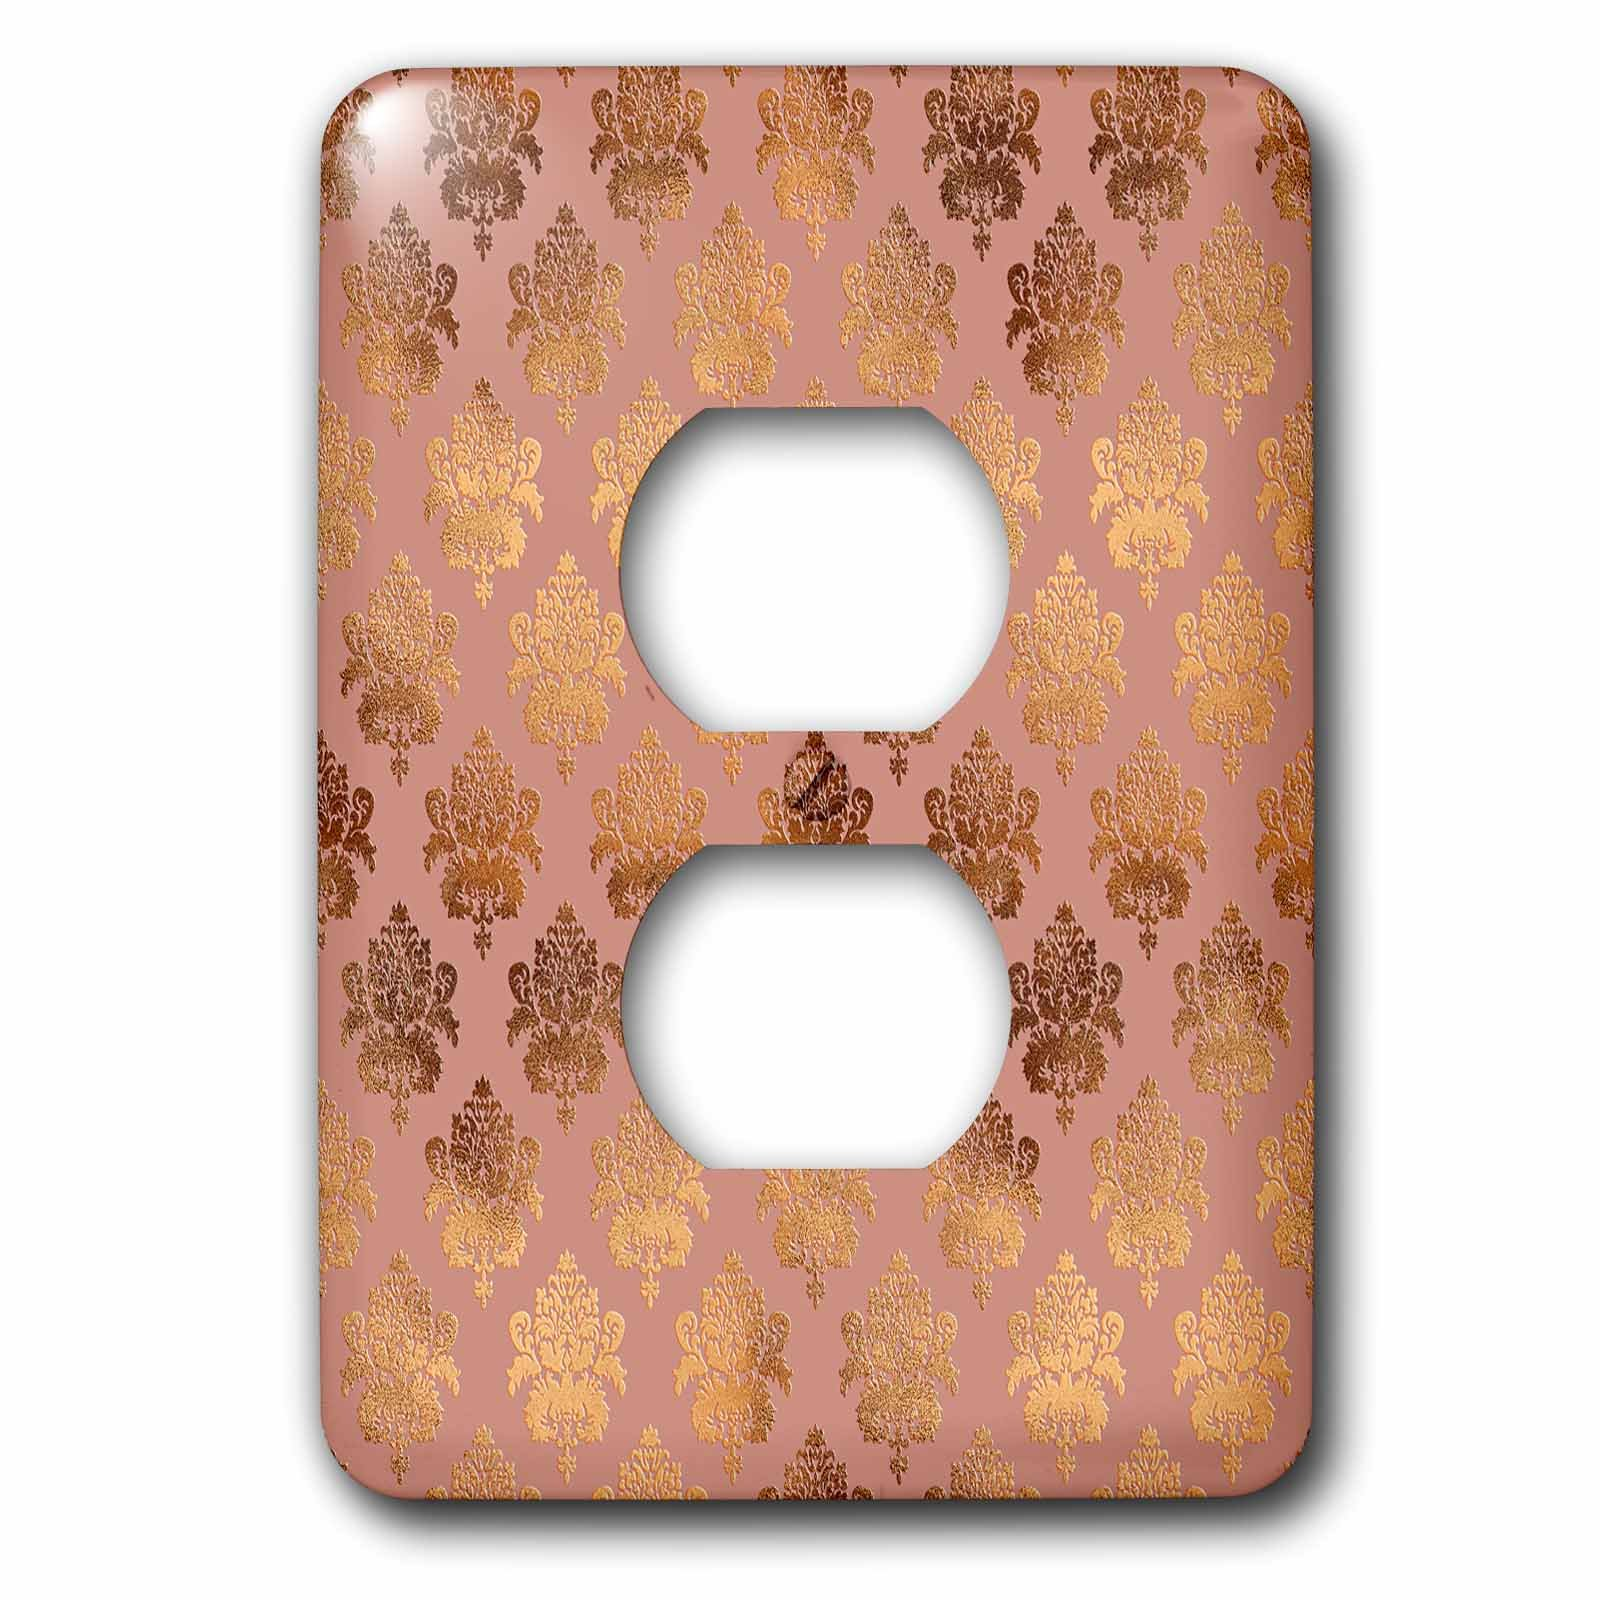 3dRose Uta Naumann Faux Glitter Pattern - Luxury Shiny Elegant Rose Gold Copper Damask Pattern - Light Switch Covers - 2 plug outlet cover (lsp_272876_6)